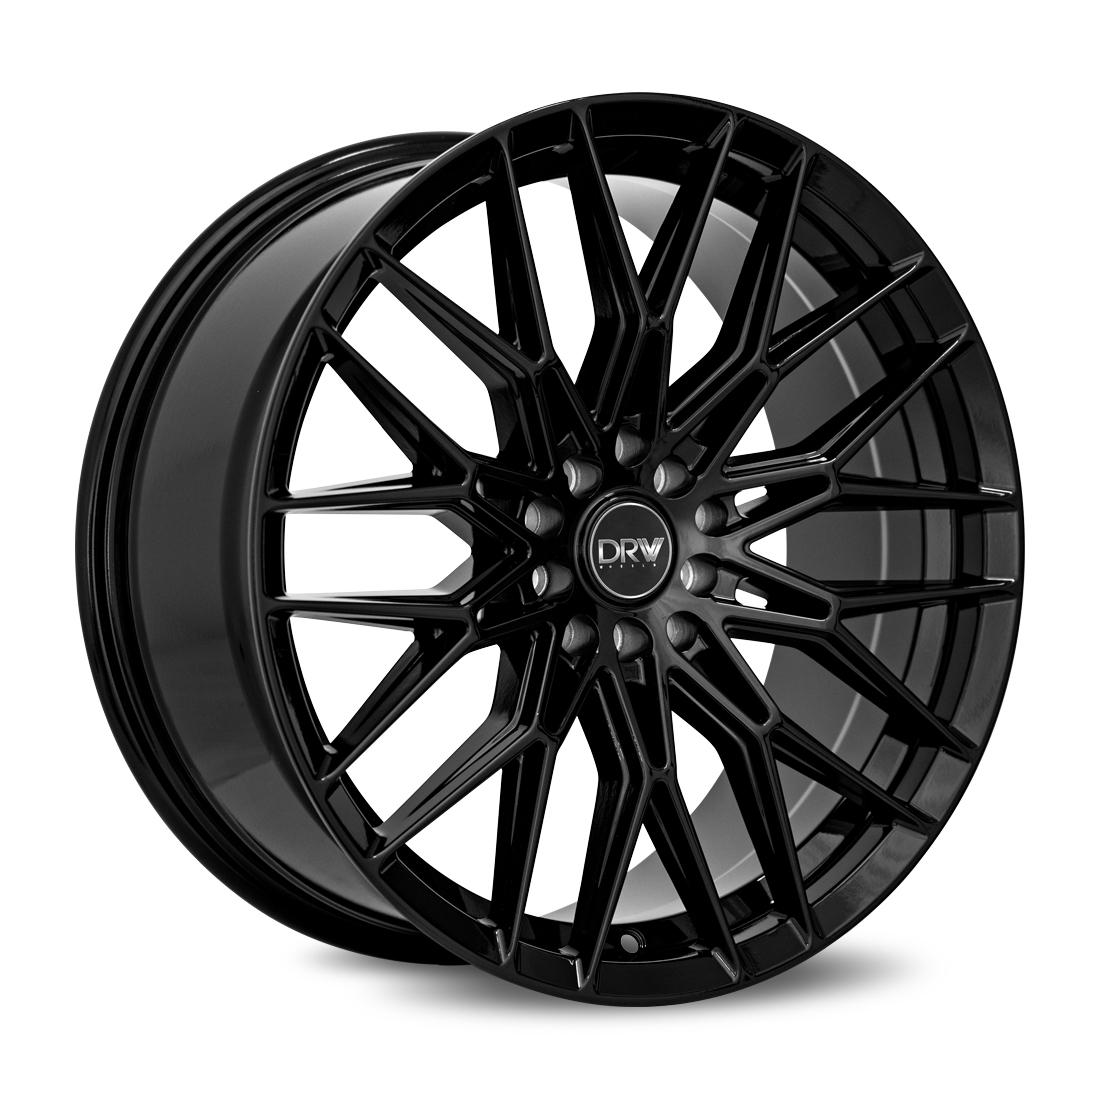 Diablo Racing Wheels DRW D21 - Gloss Black Rim